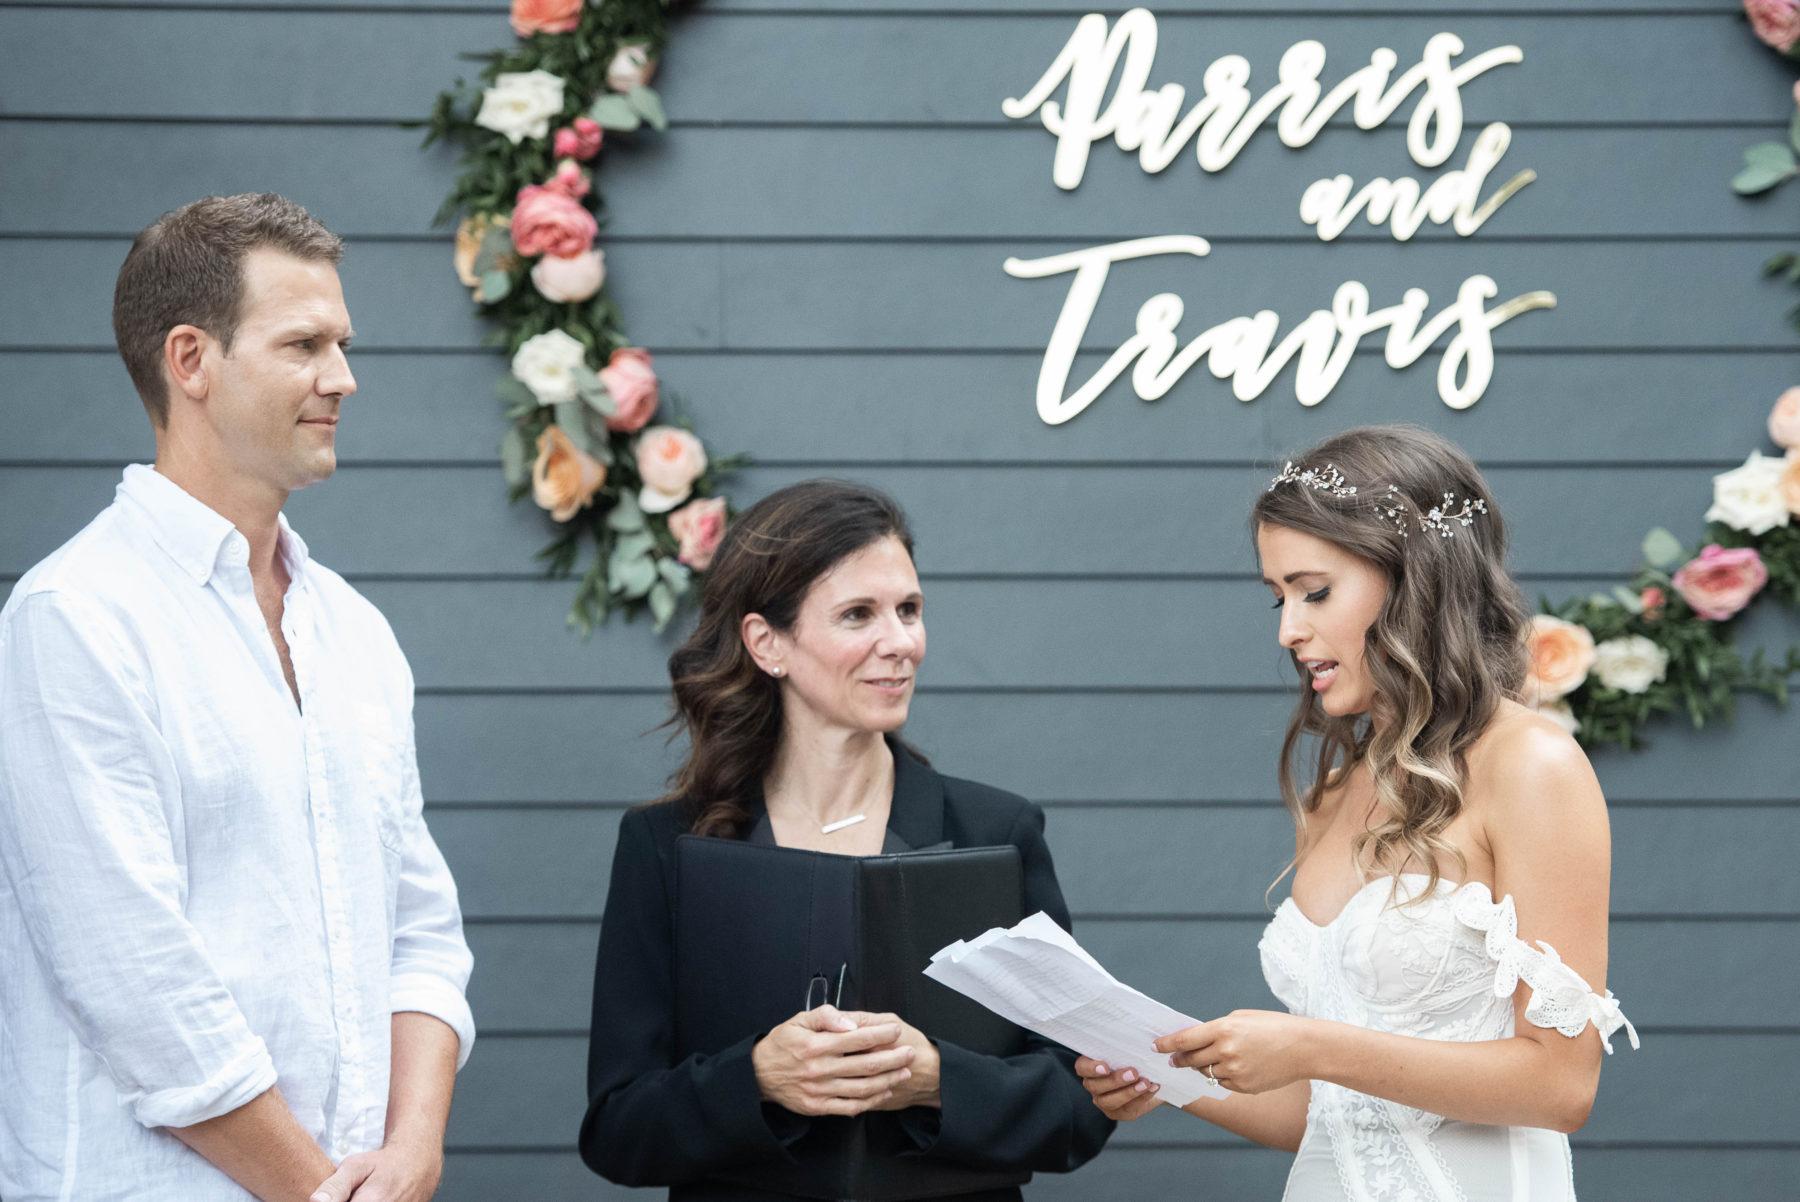 Nashville Wedding Photographer Gina Peterson featured on Nashville Bride Guide